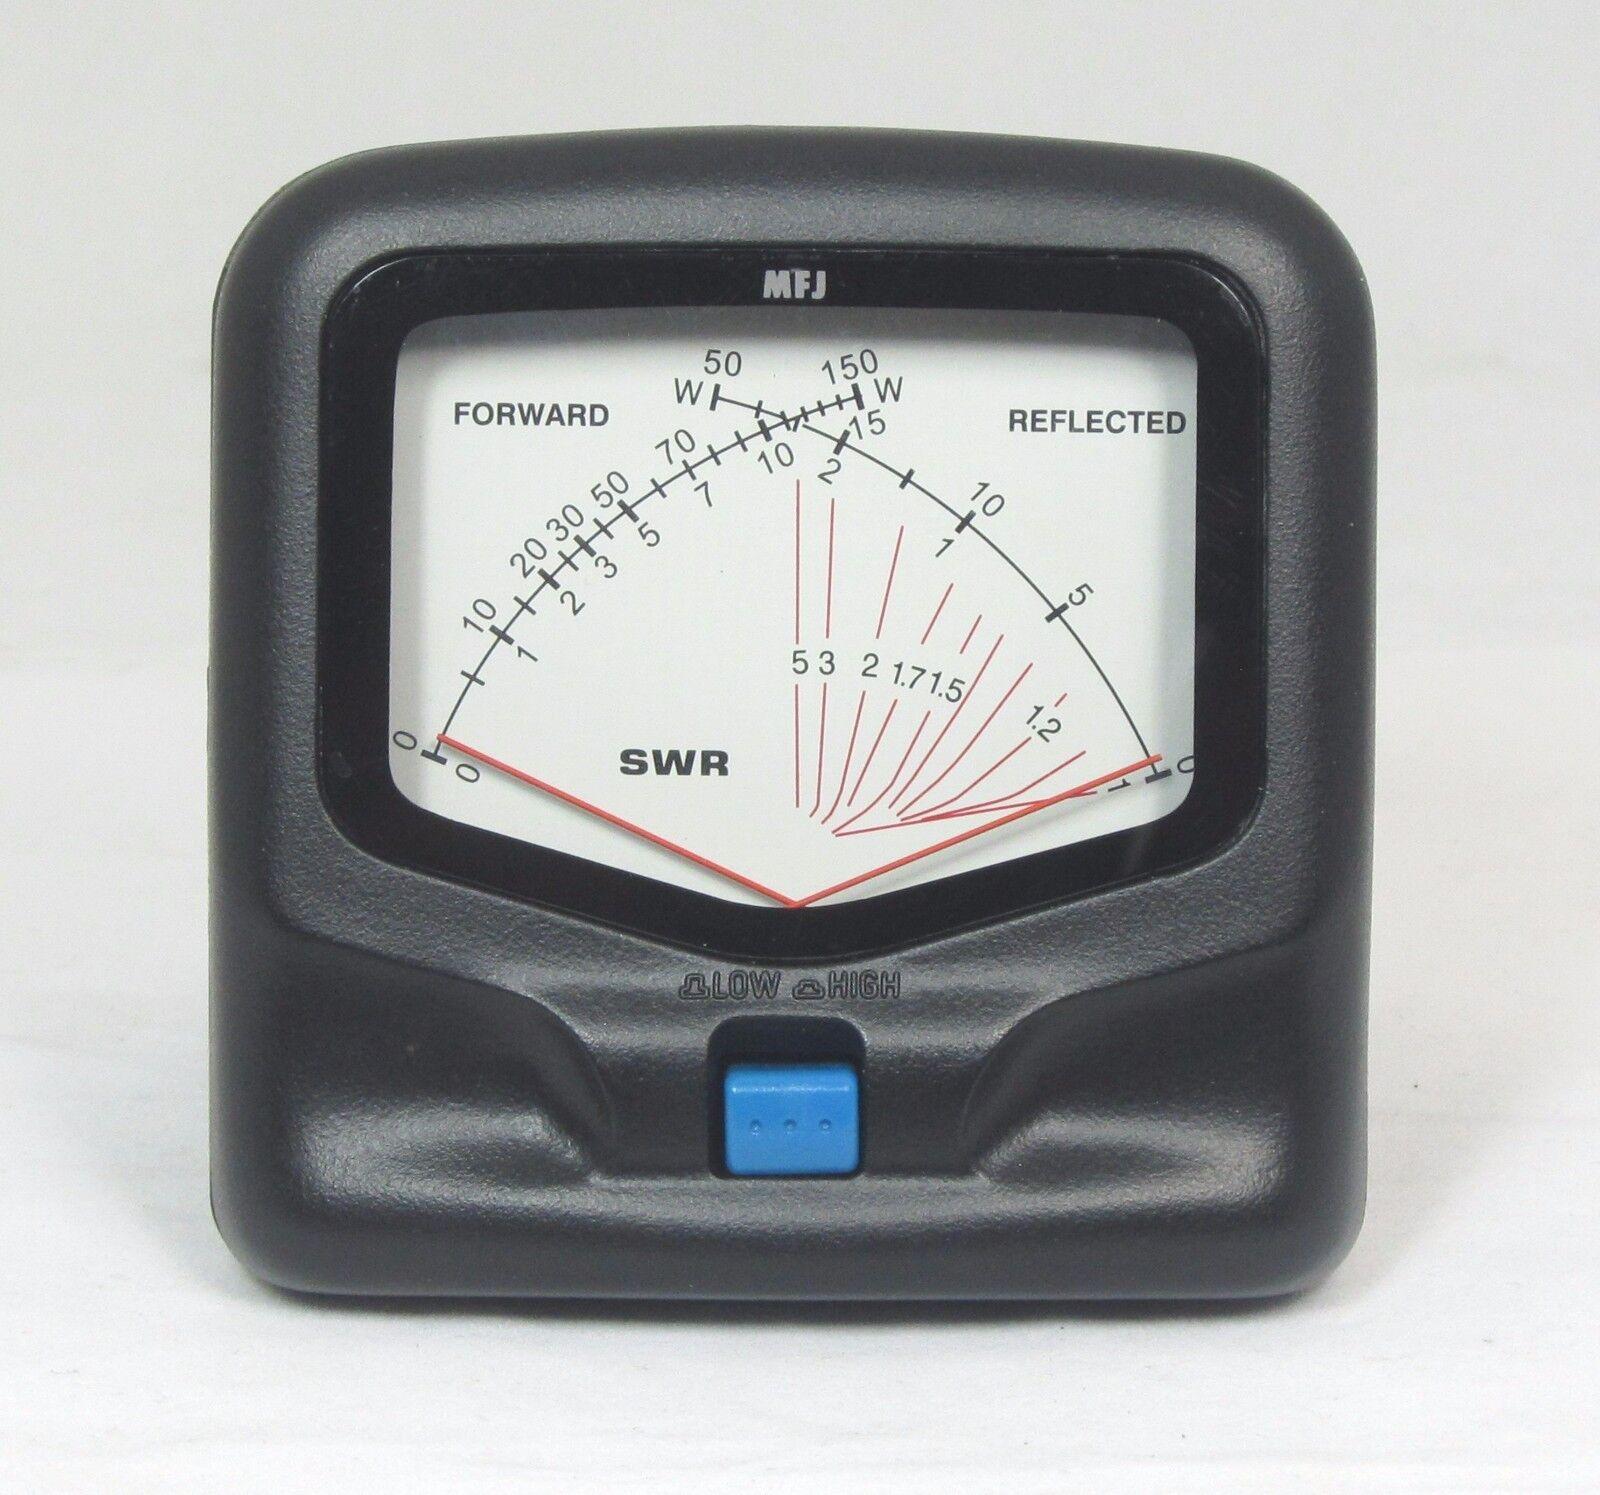 New MFJ-842 VHF/UHF SWR/Wattmeter - 140 to 525 MHz 15/150 Watts. Base mobile ham.